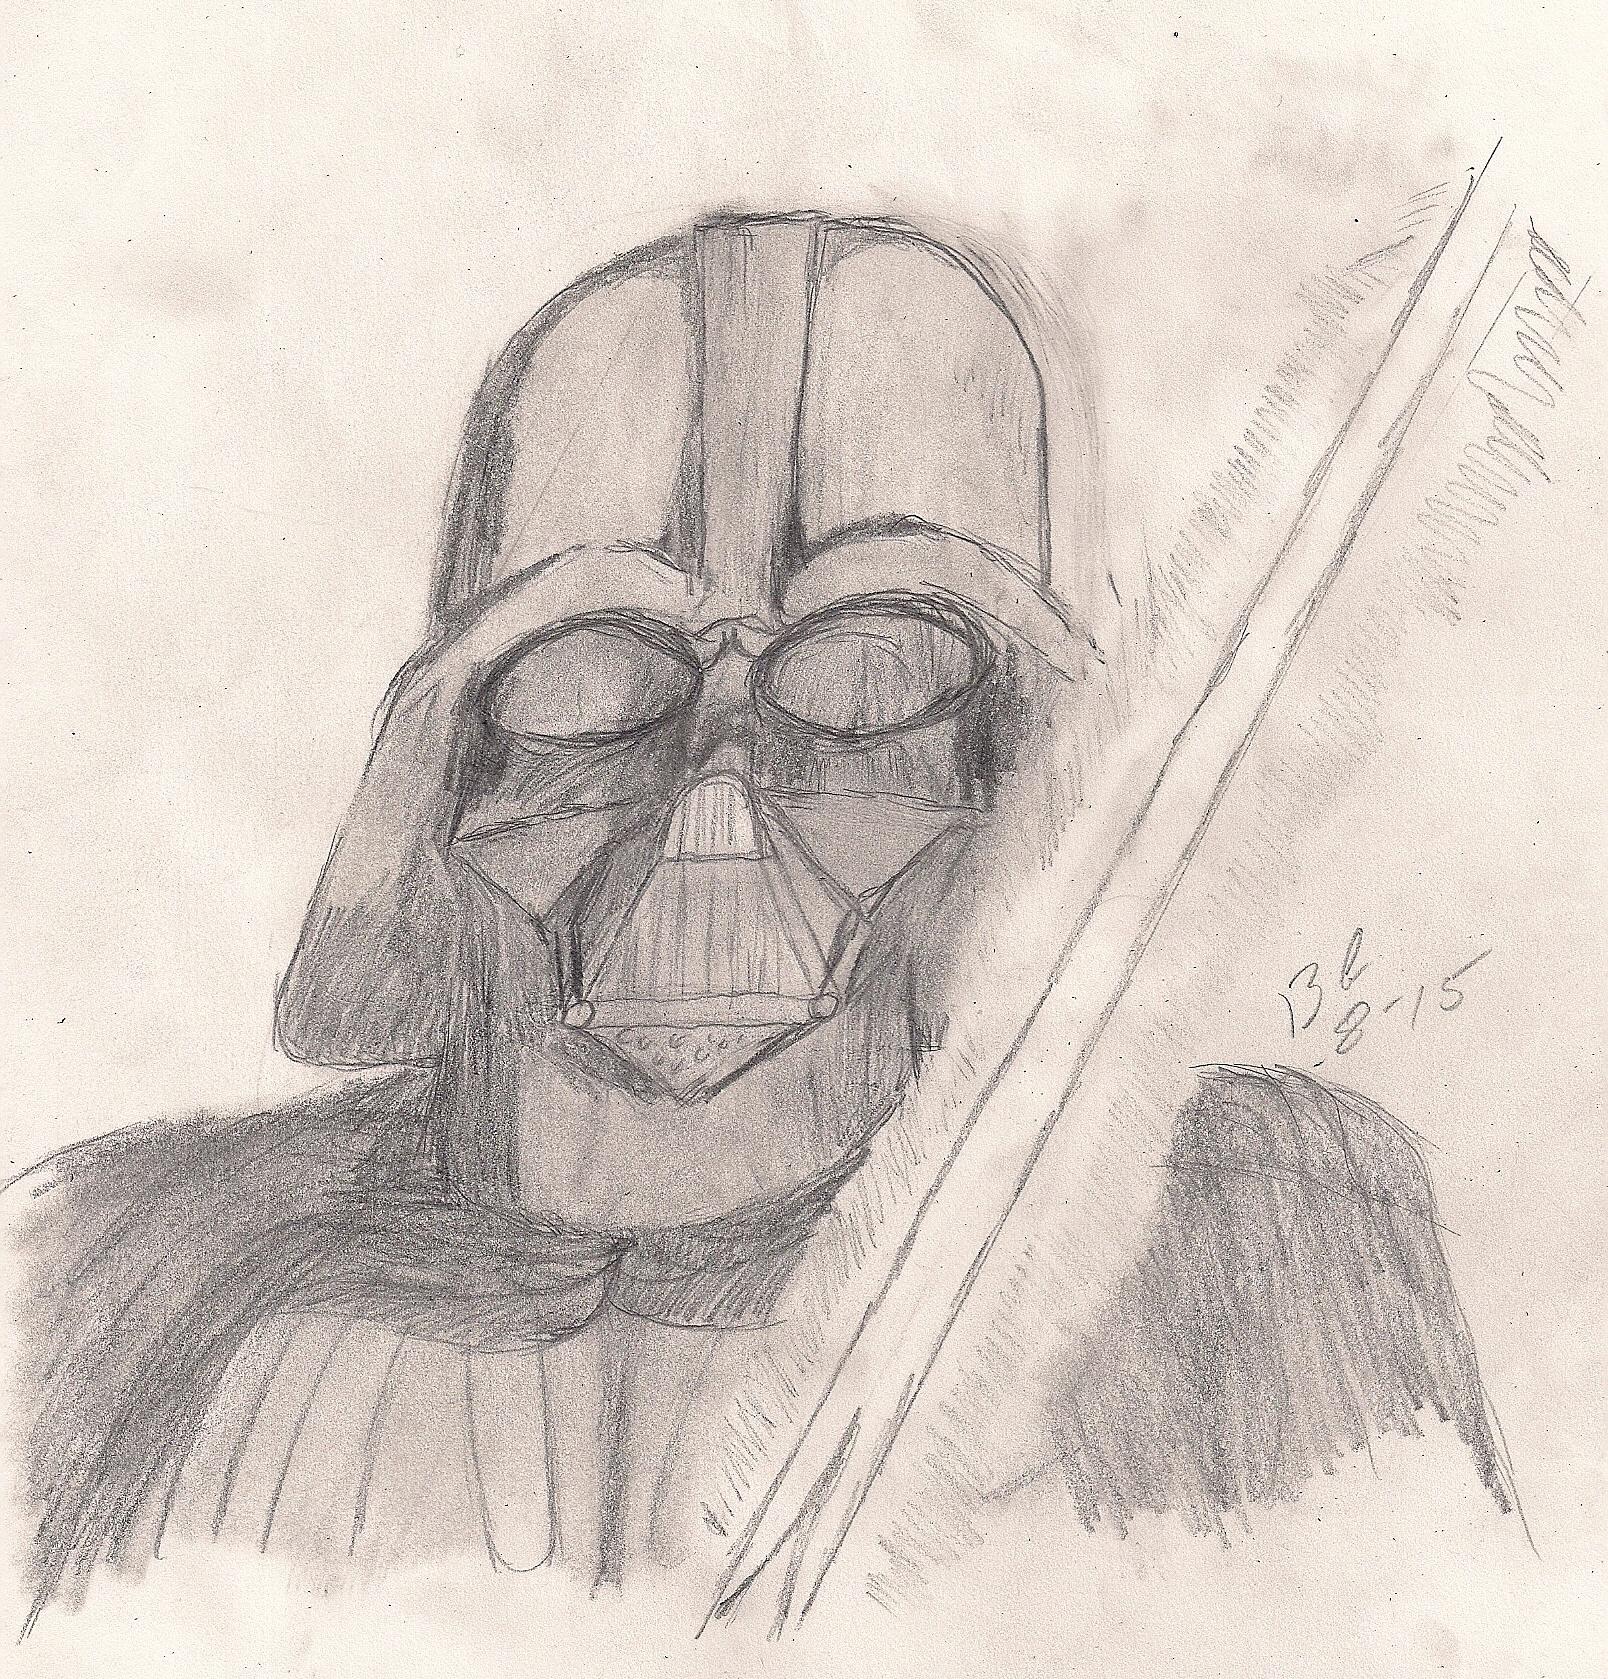 Darth Vader by Bobby77